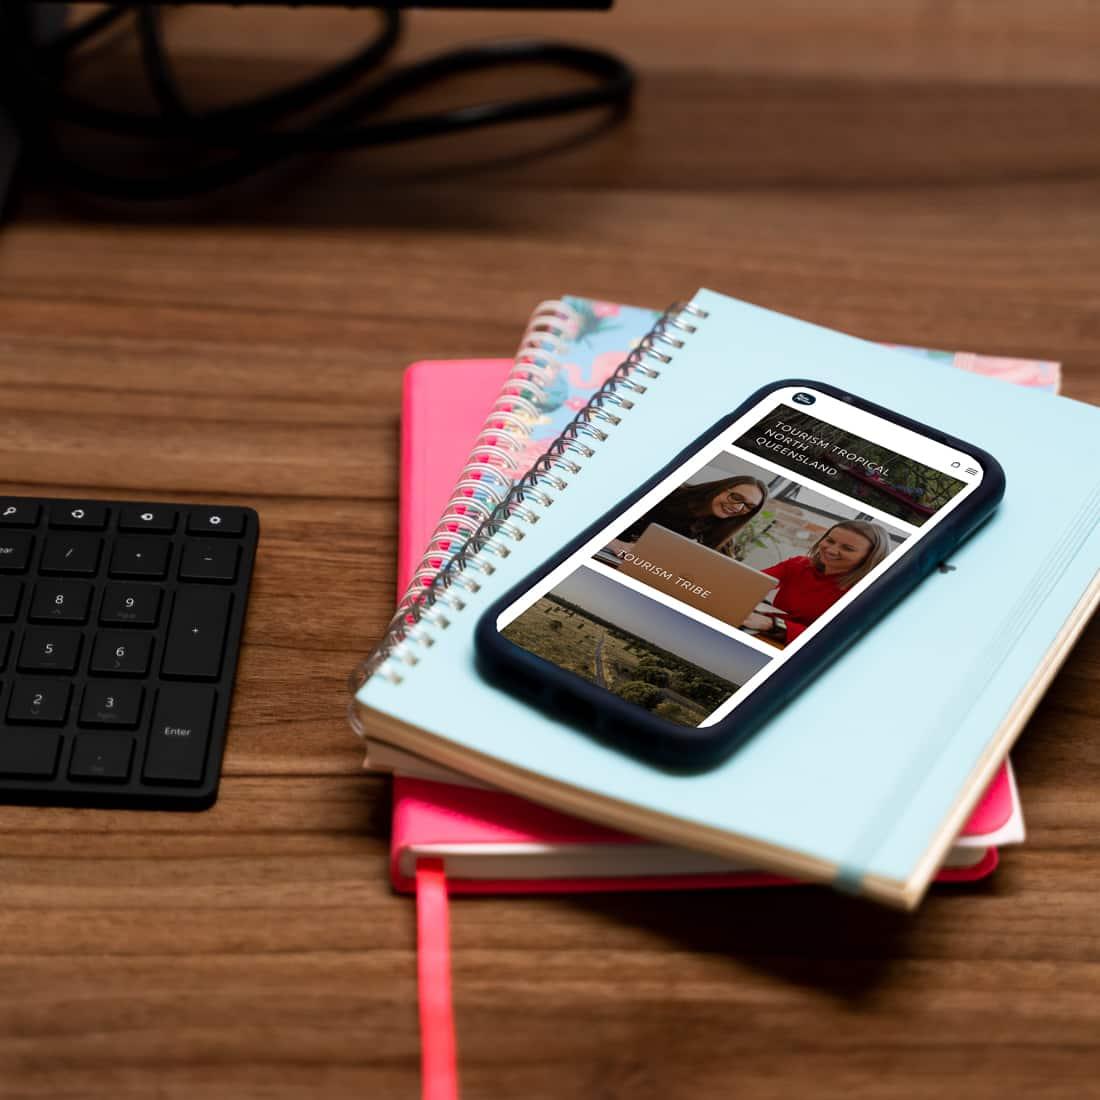 Media Mortar_Instagram Stories_Open phone on notebooks